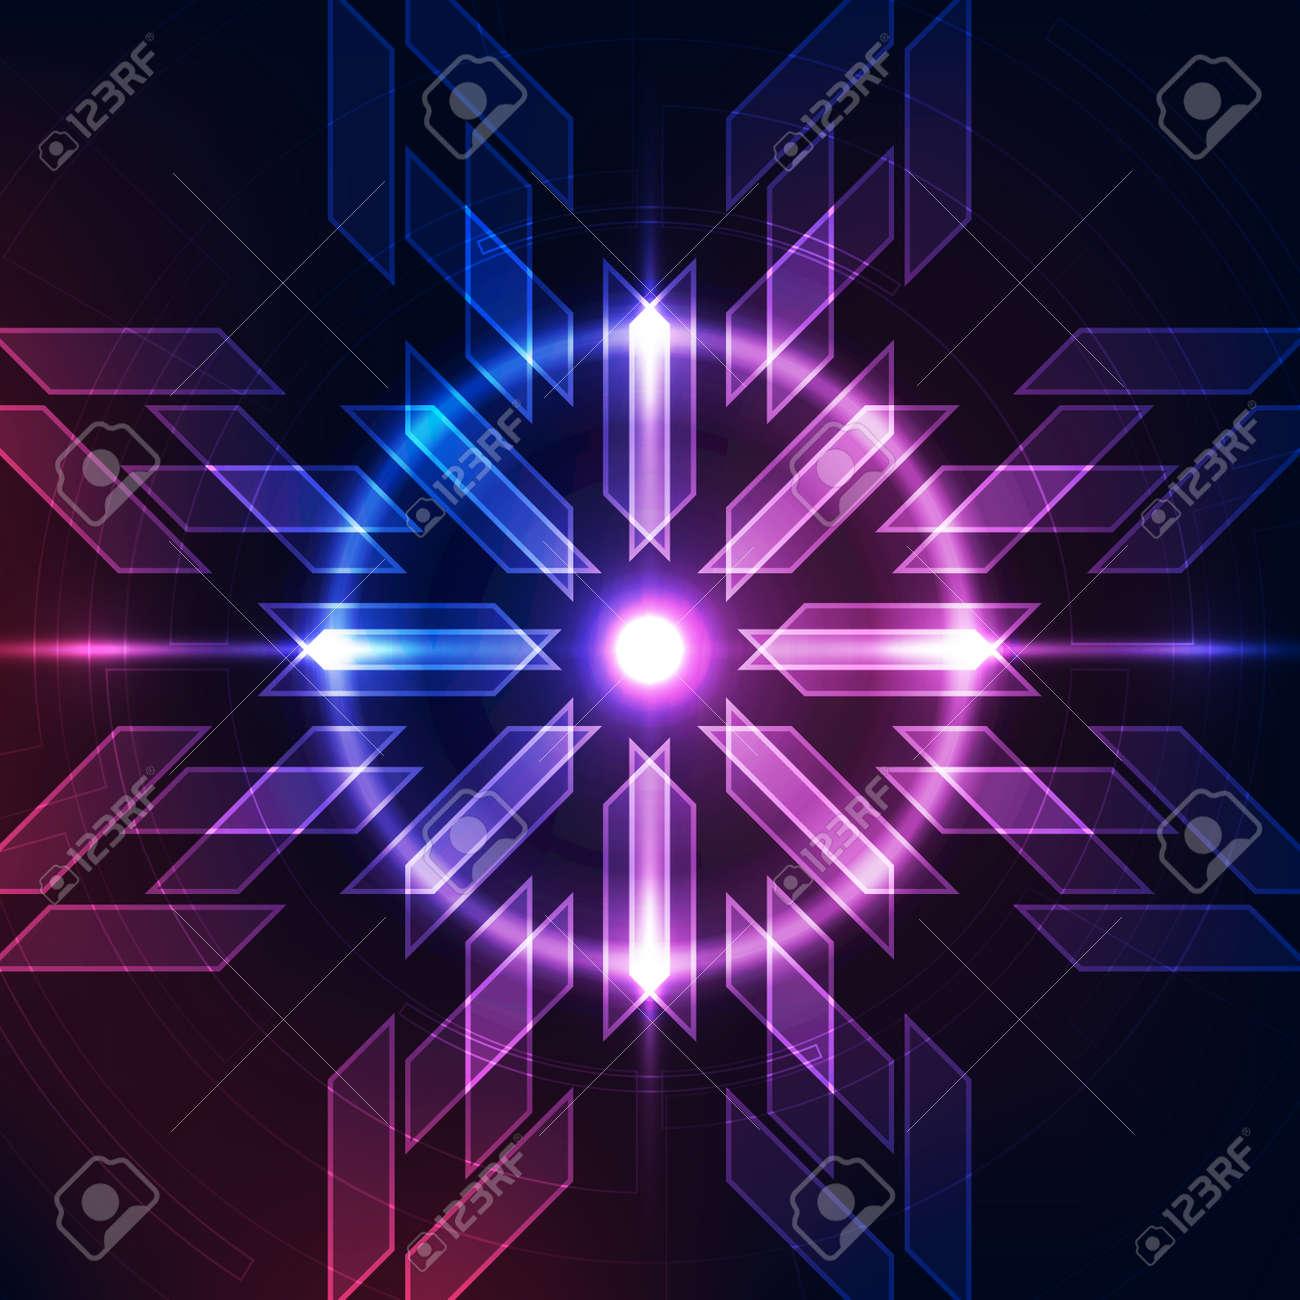 Abstract futuristic digital technology - 168282634